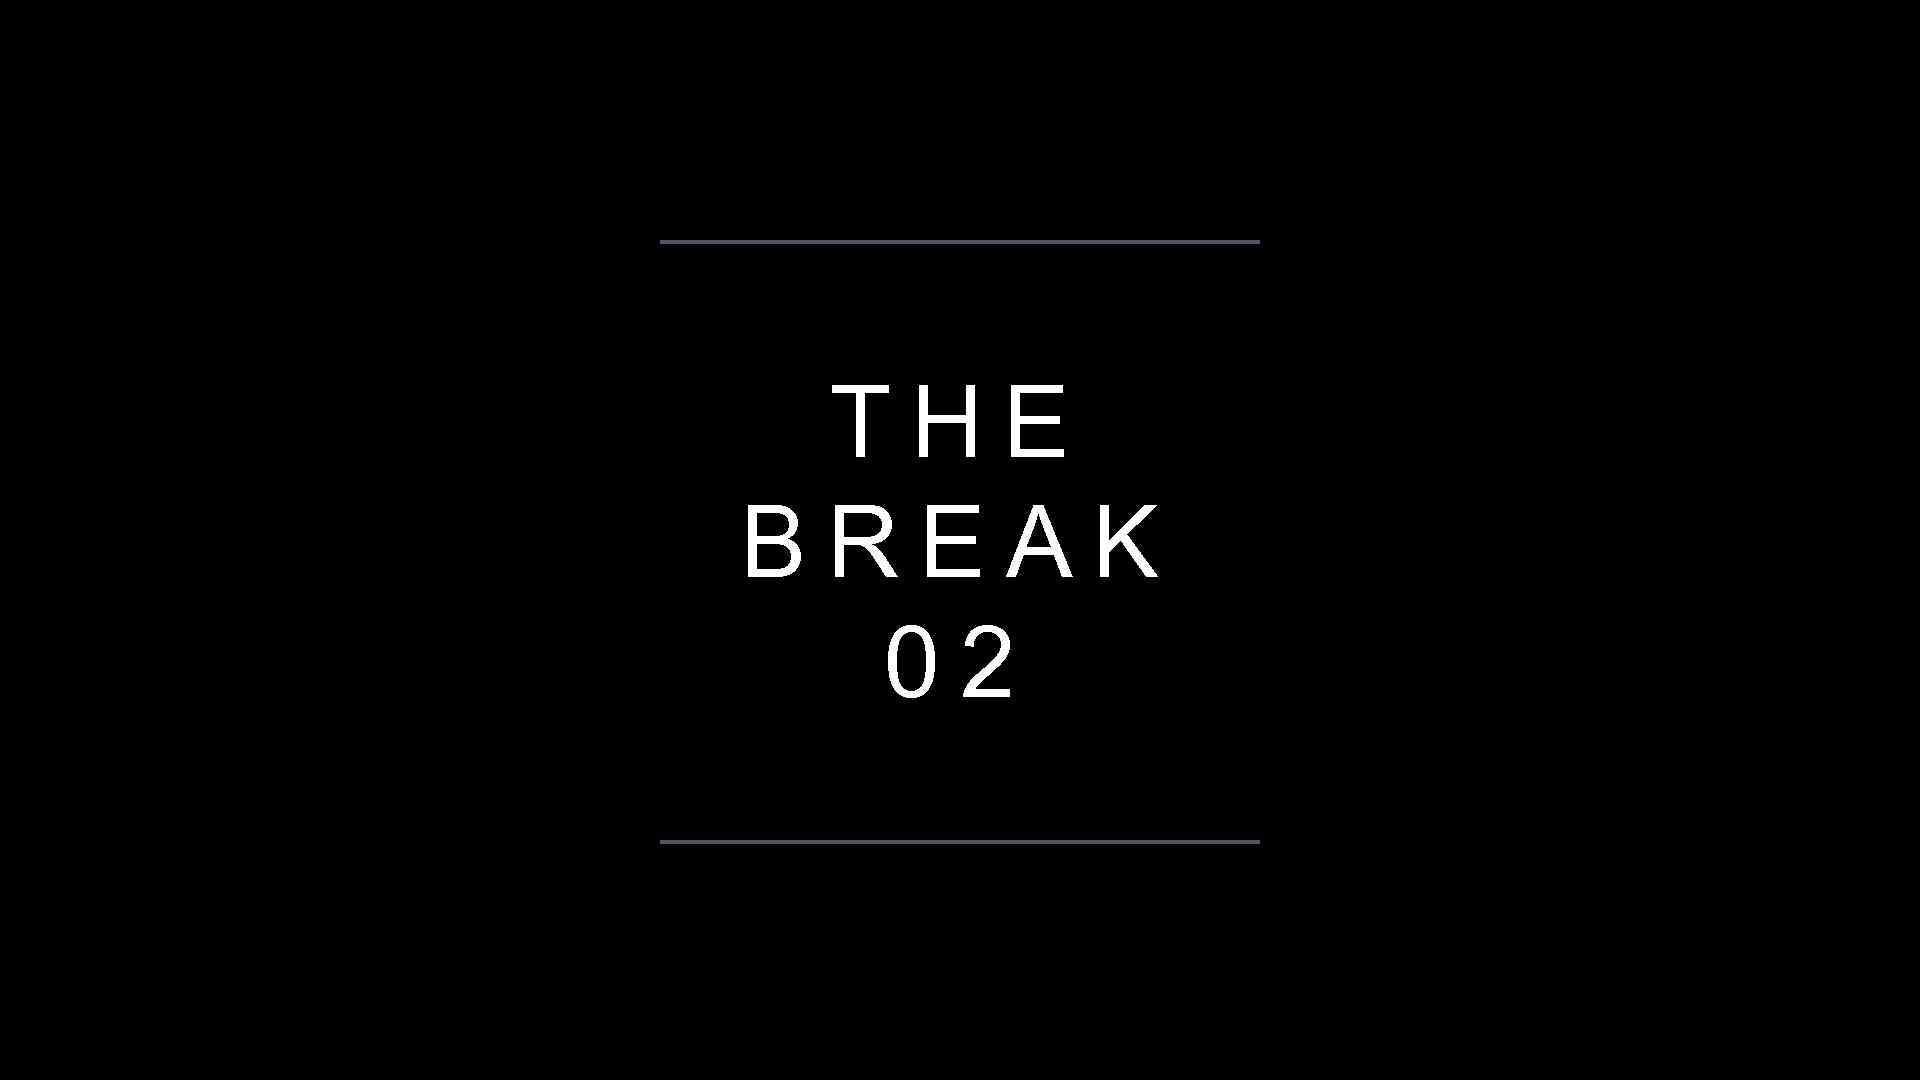 THE BREAK 02